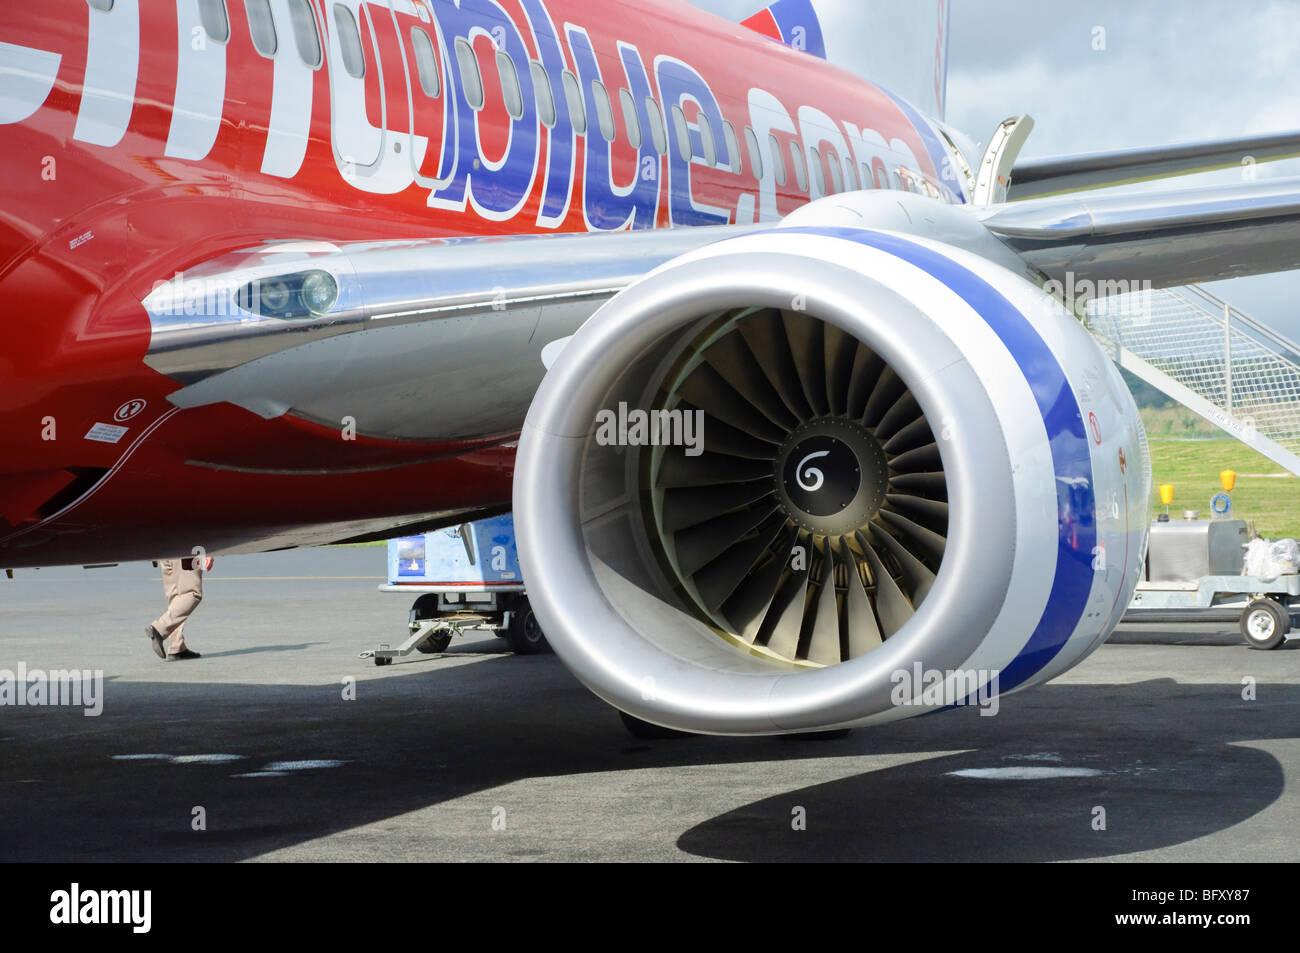 Engine of a modern Pacific Blue/Virgin Australia Boeing 737-800 plane; jet engine; aircraft; turbojet; turbofan; - Stock Image